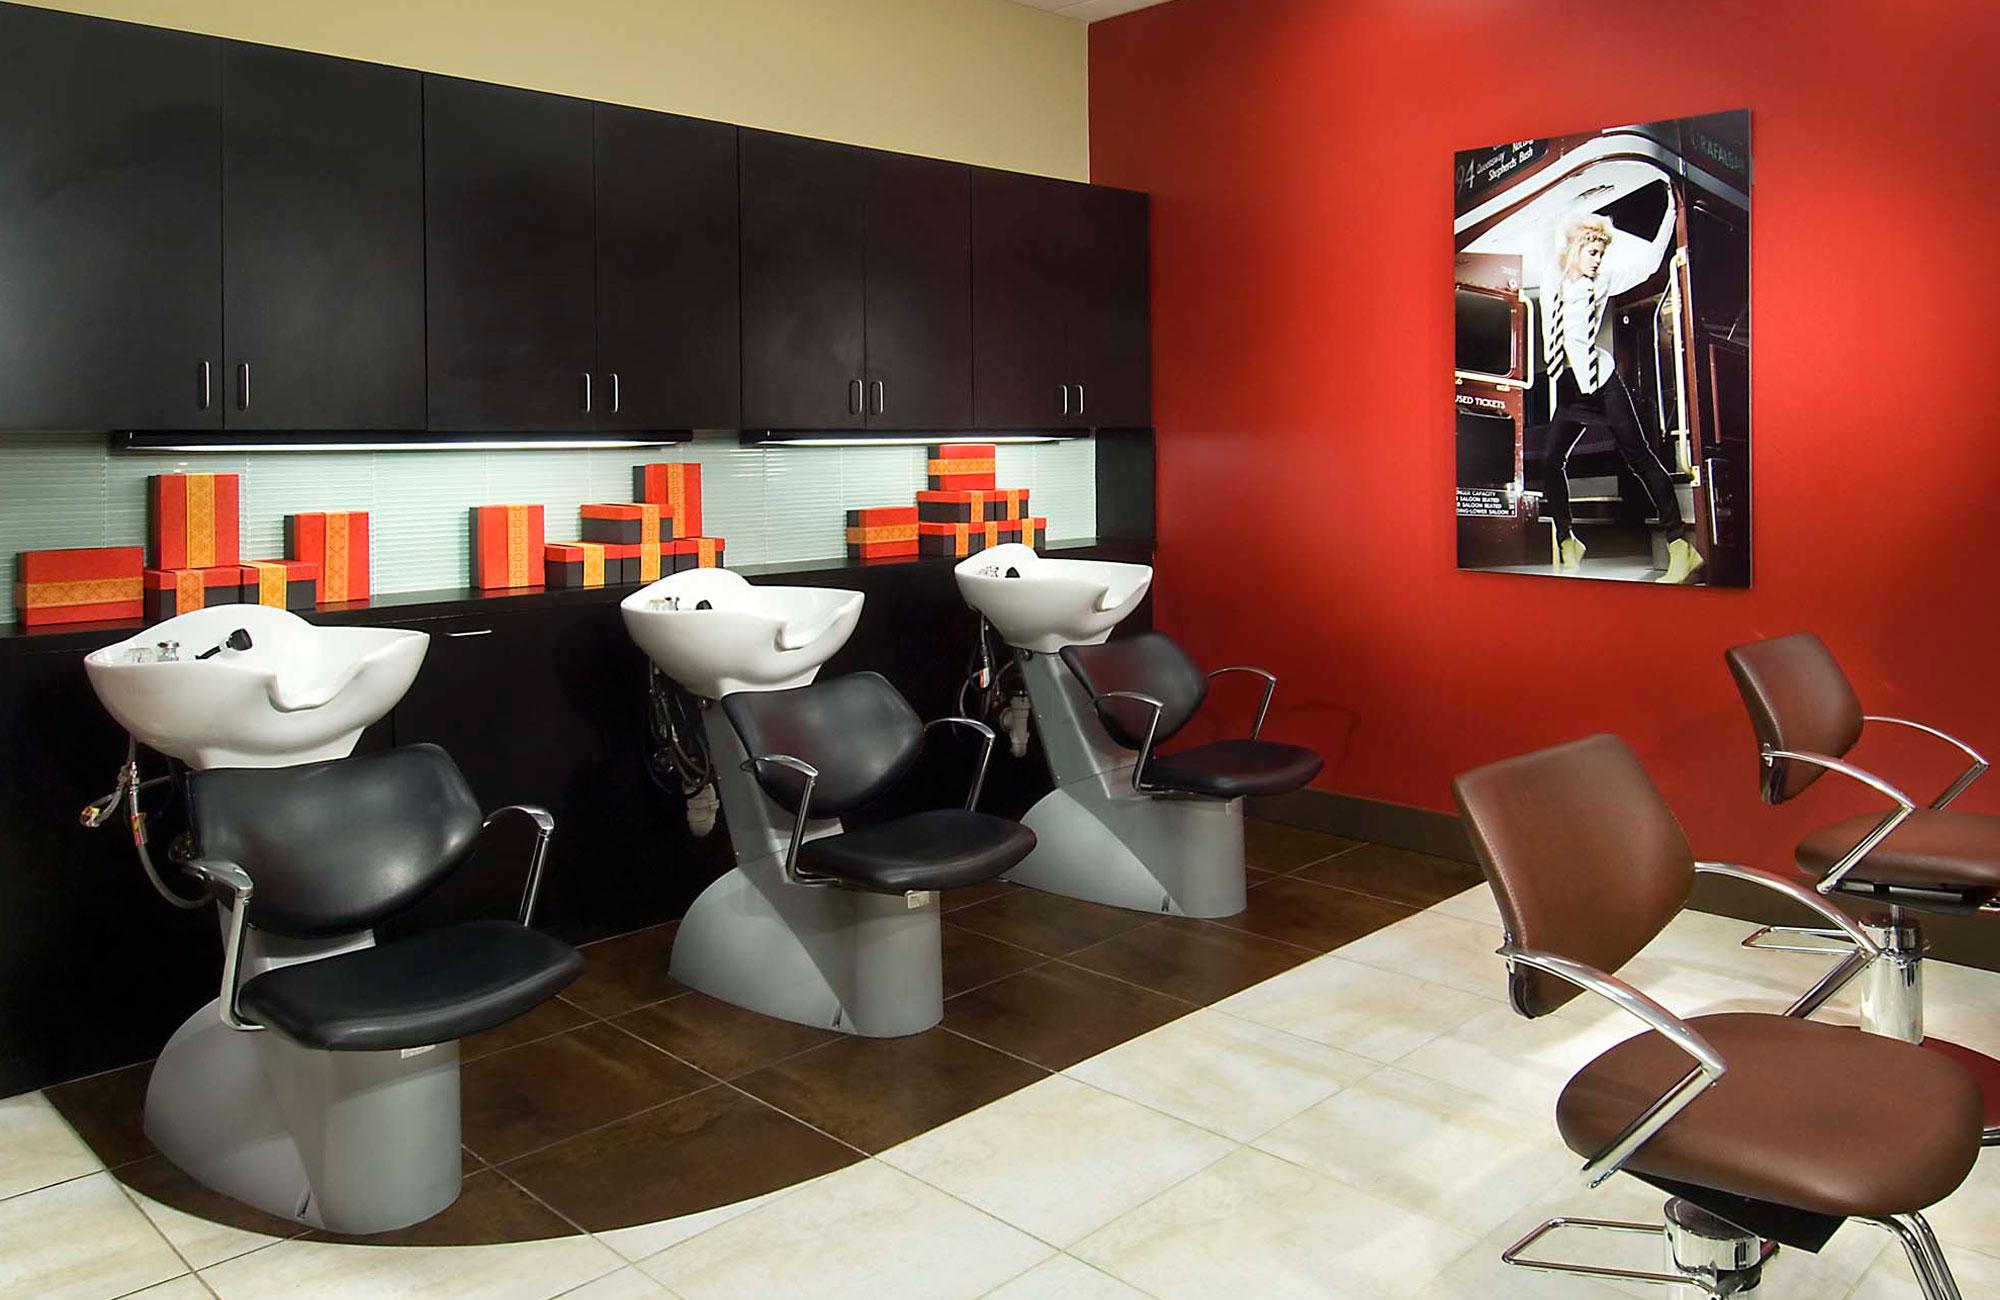 salon-interior3.jpg